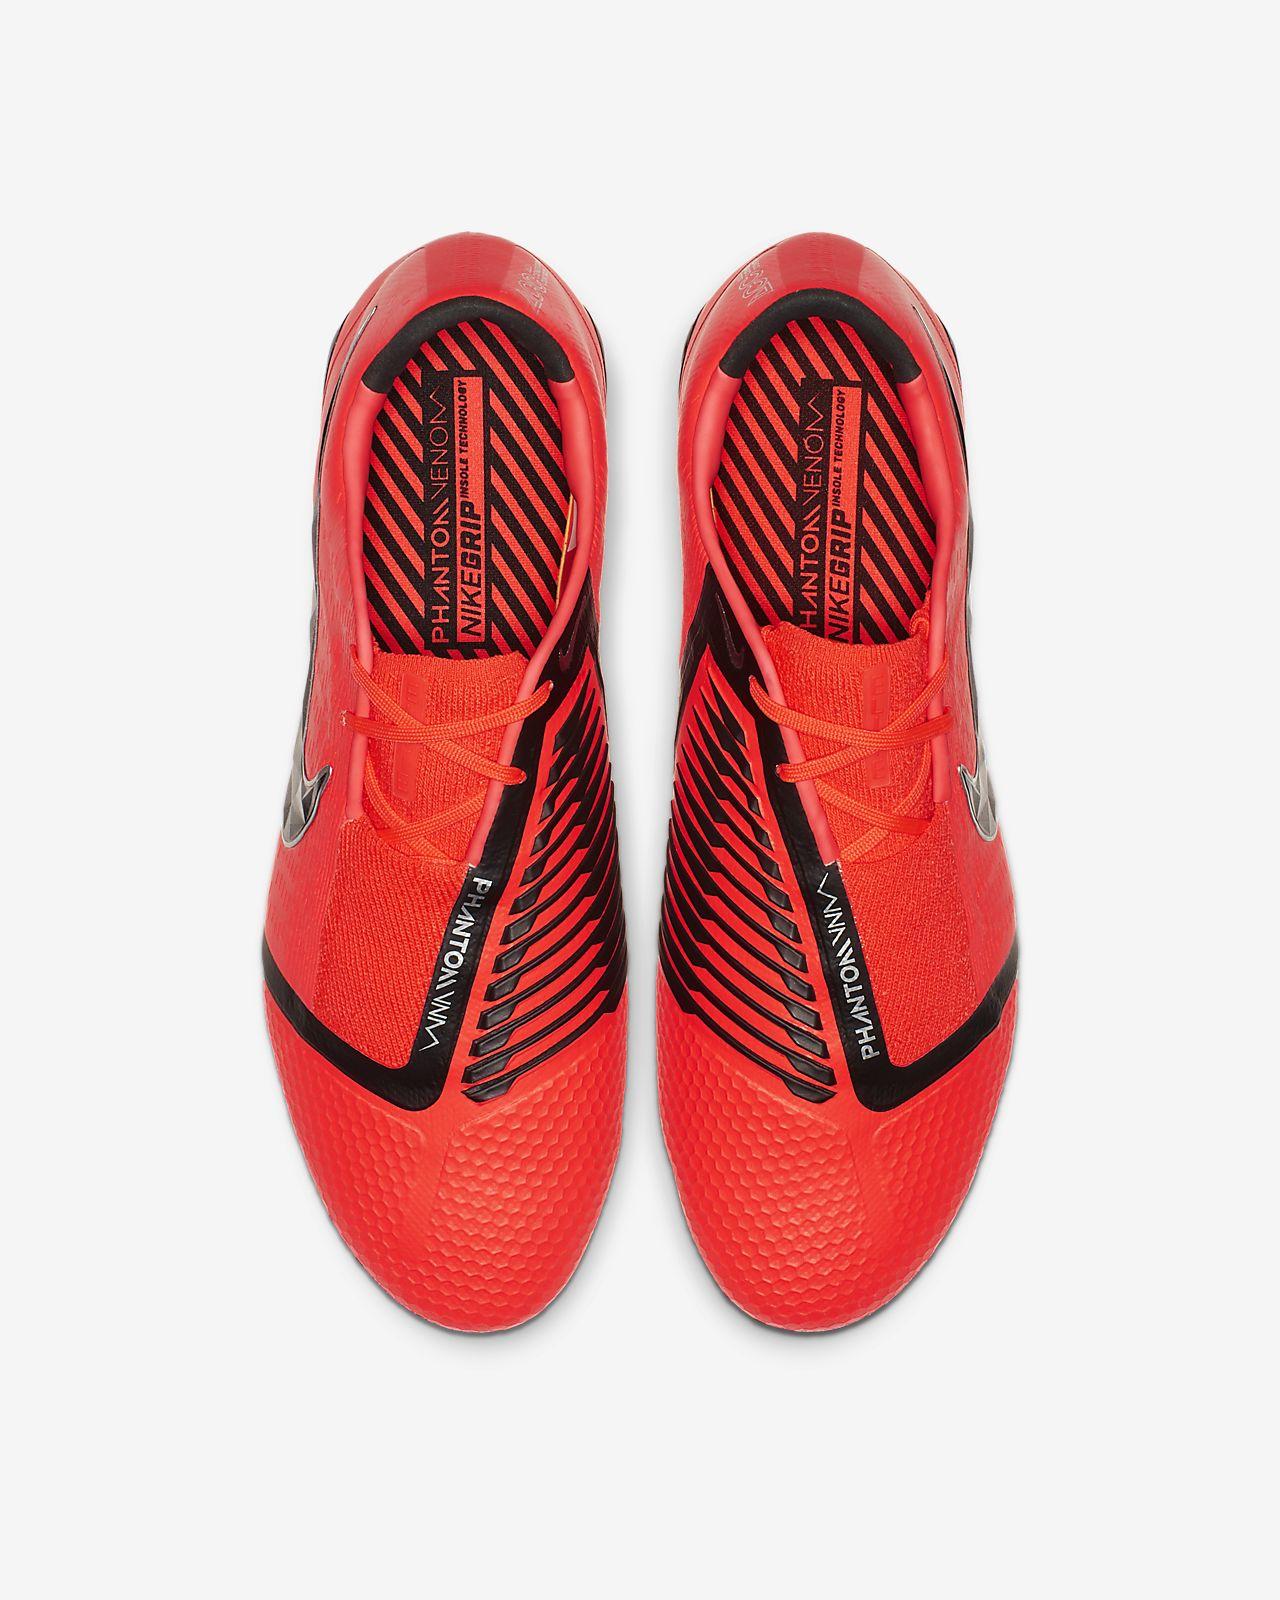 c645ca5bebc Nike PhantomVNM Elite Game Over FG Firm-Ground Football Boot. Nike ...